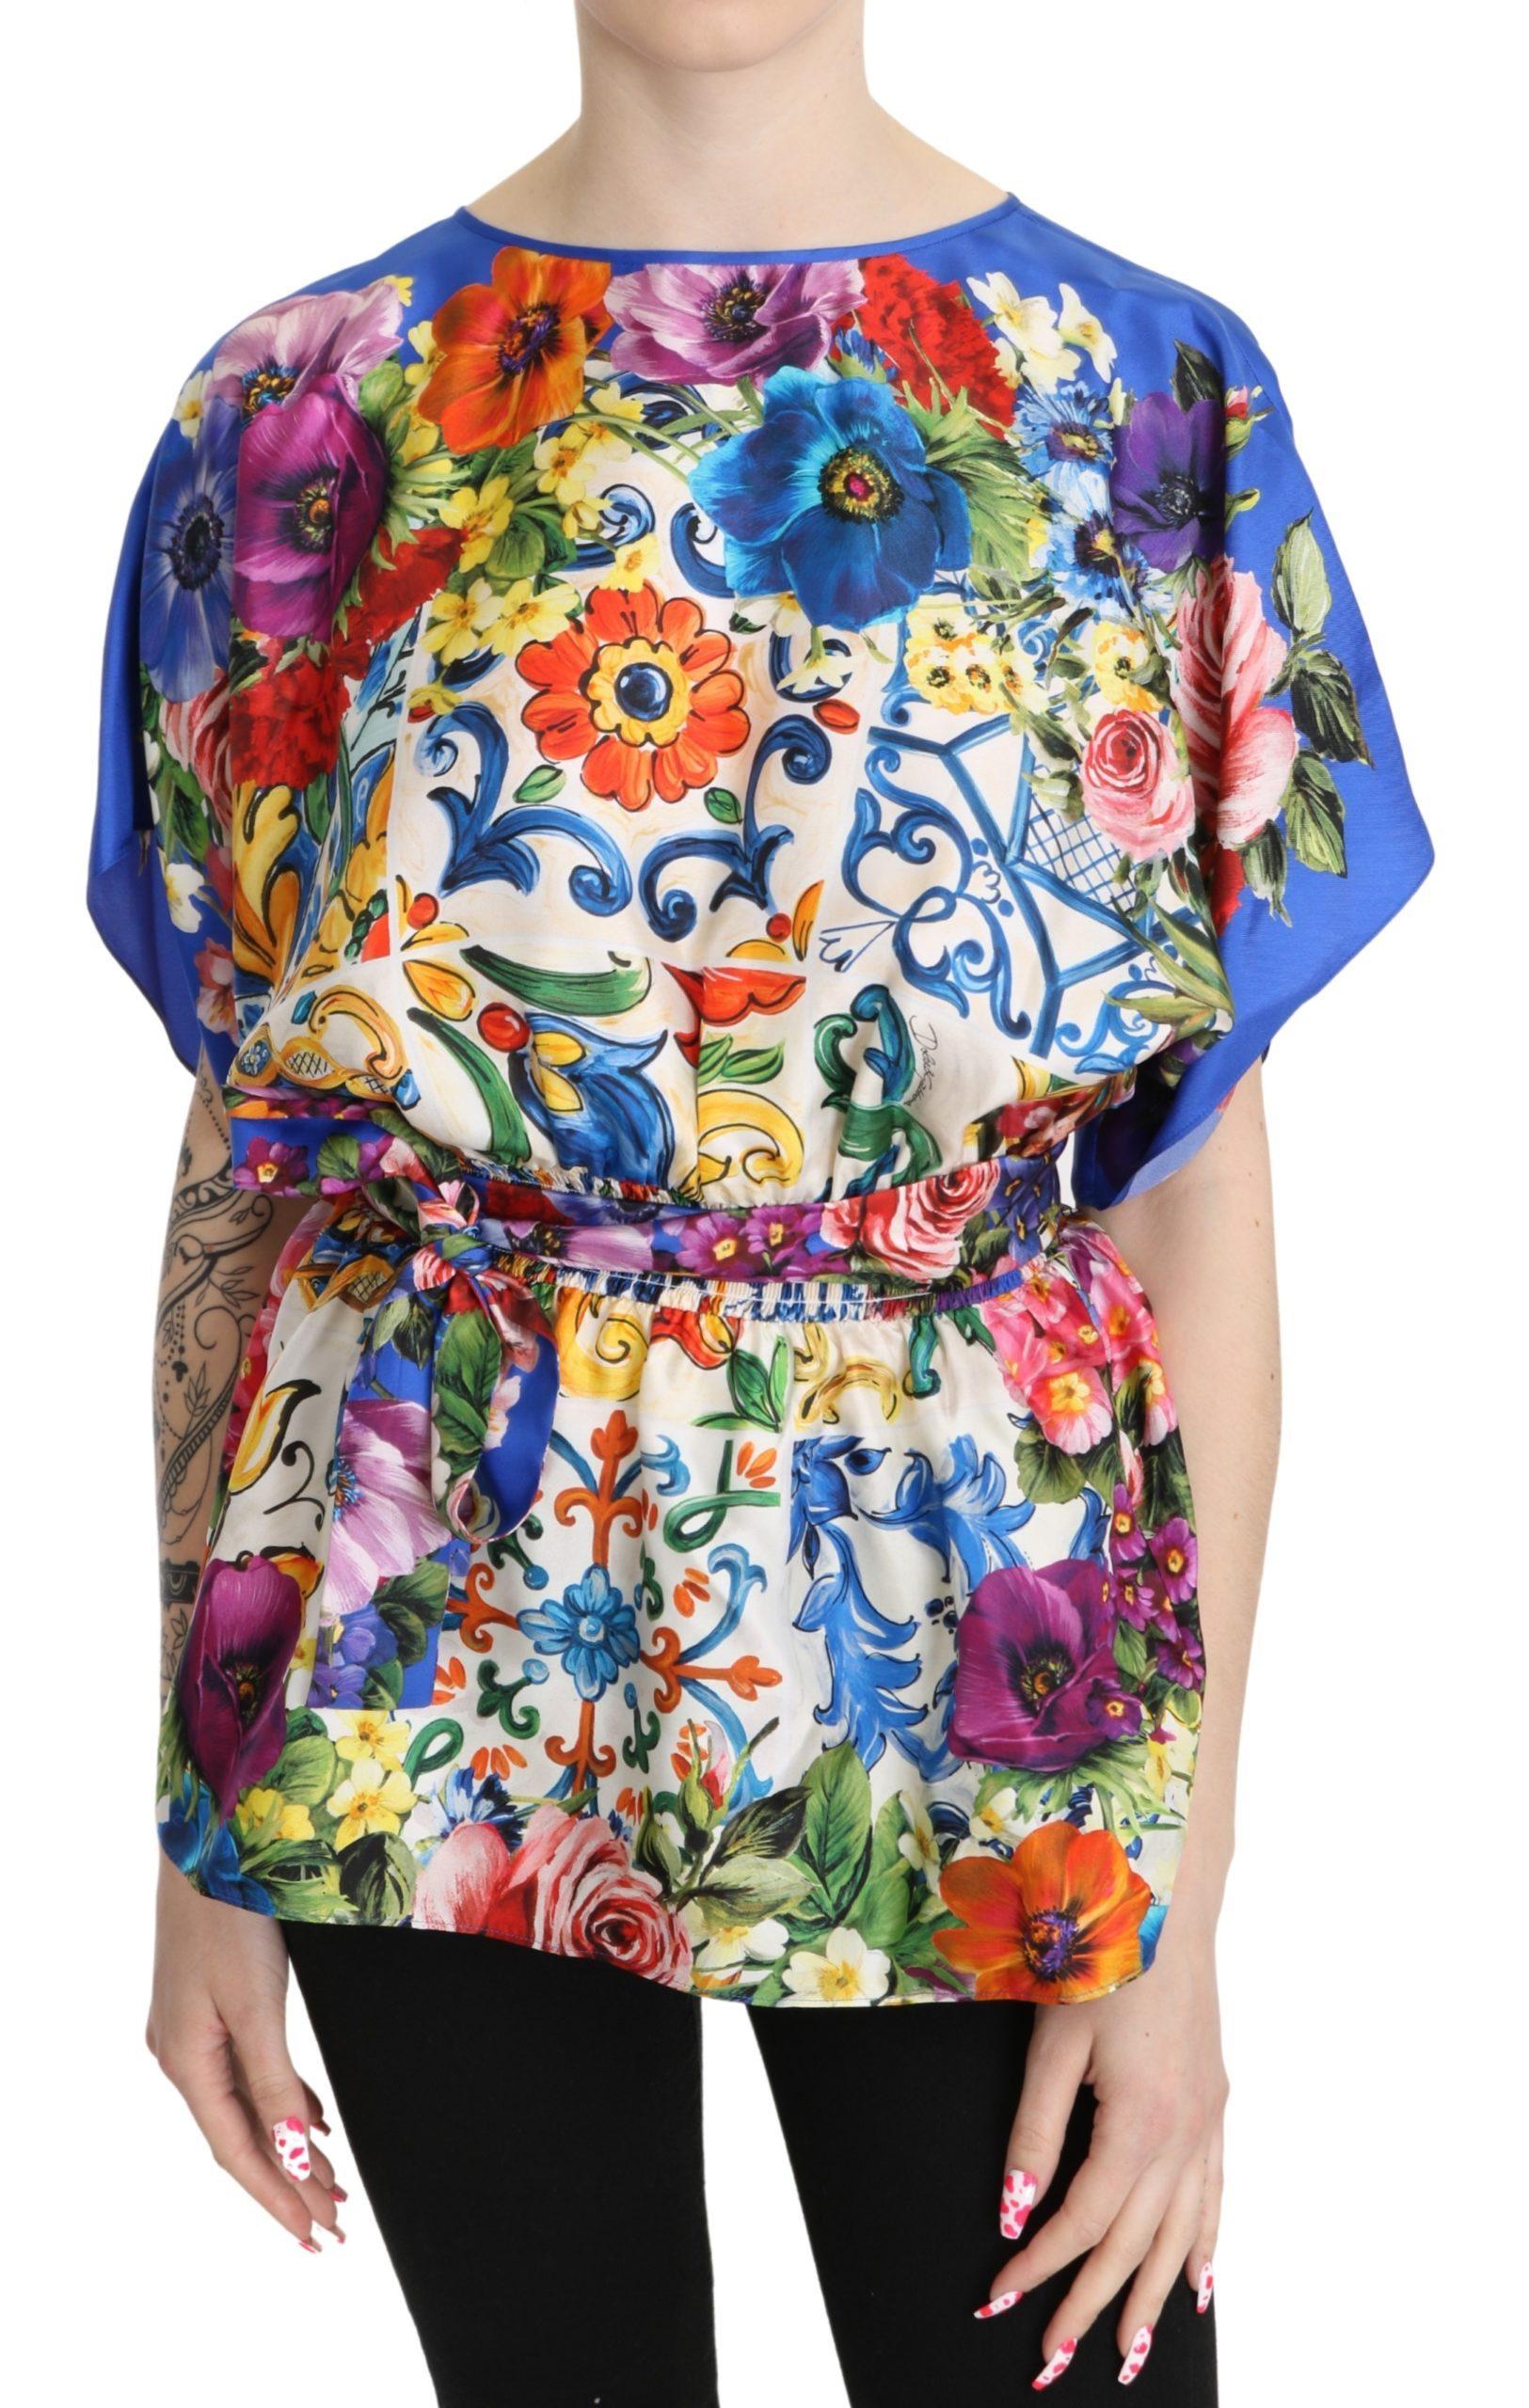 Dolce & Gabbana Women's Majolica Silk Casual Top Multicolor TSH5263 - IT42|M